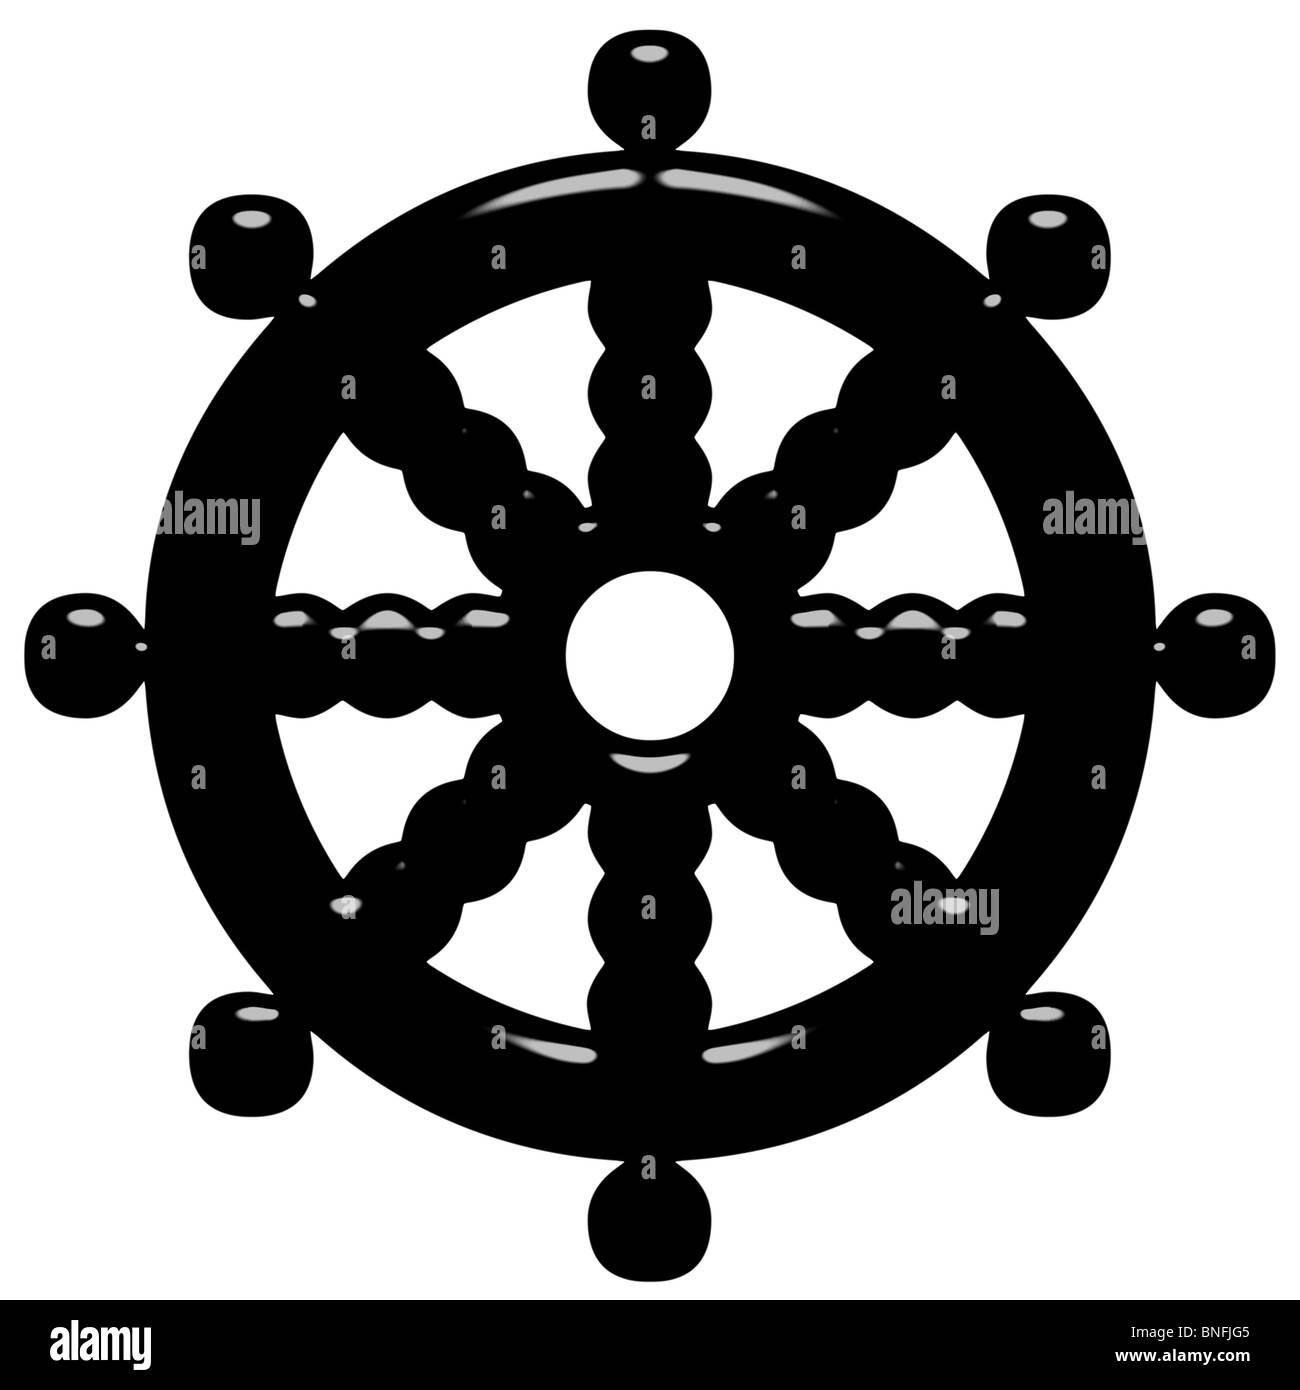 Wheel of doctrine stock photos wheel of doctrine stock images 3d buddhism symbol wheel of dharma stock image biocorpaavc